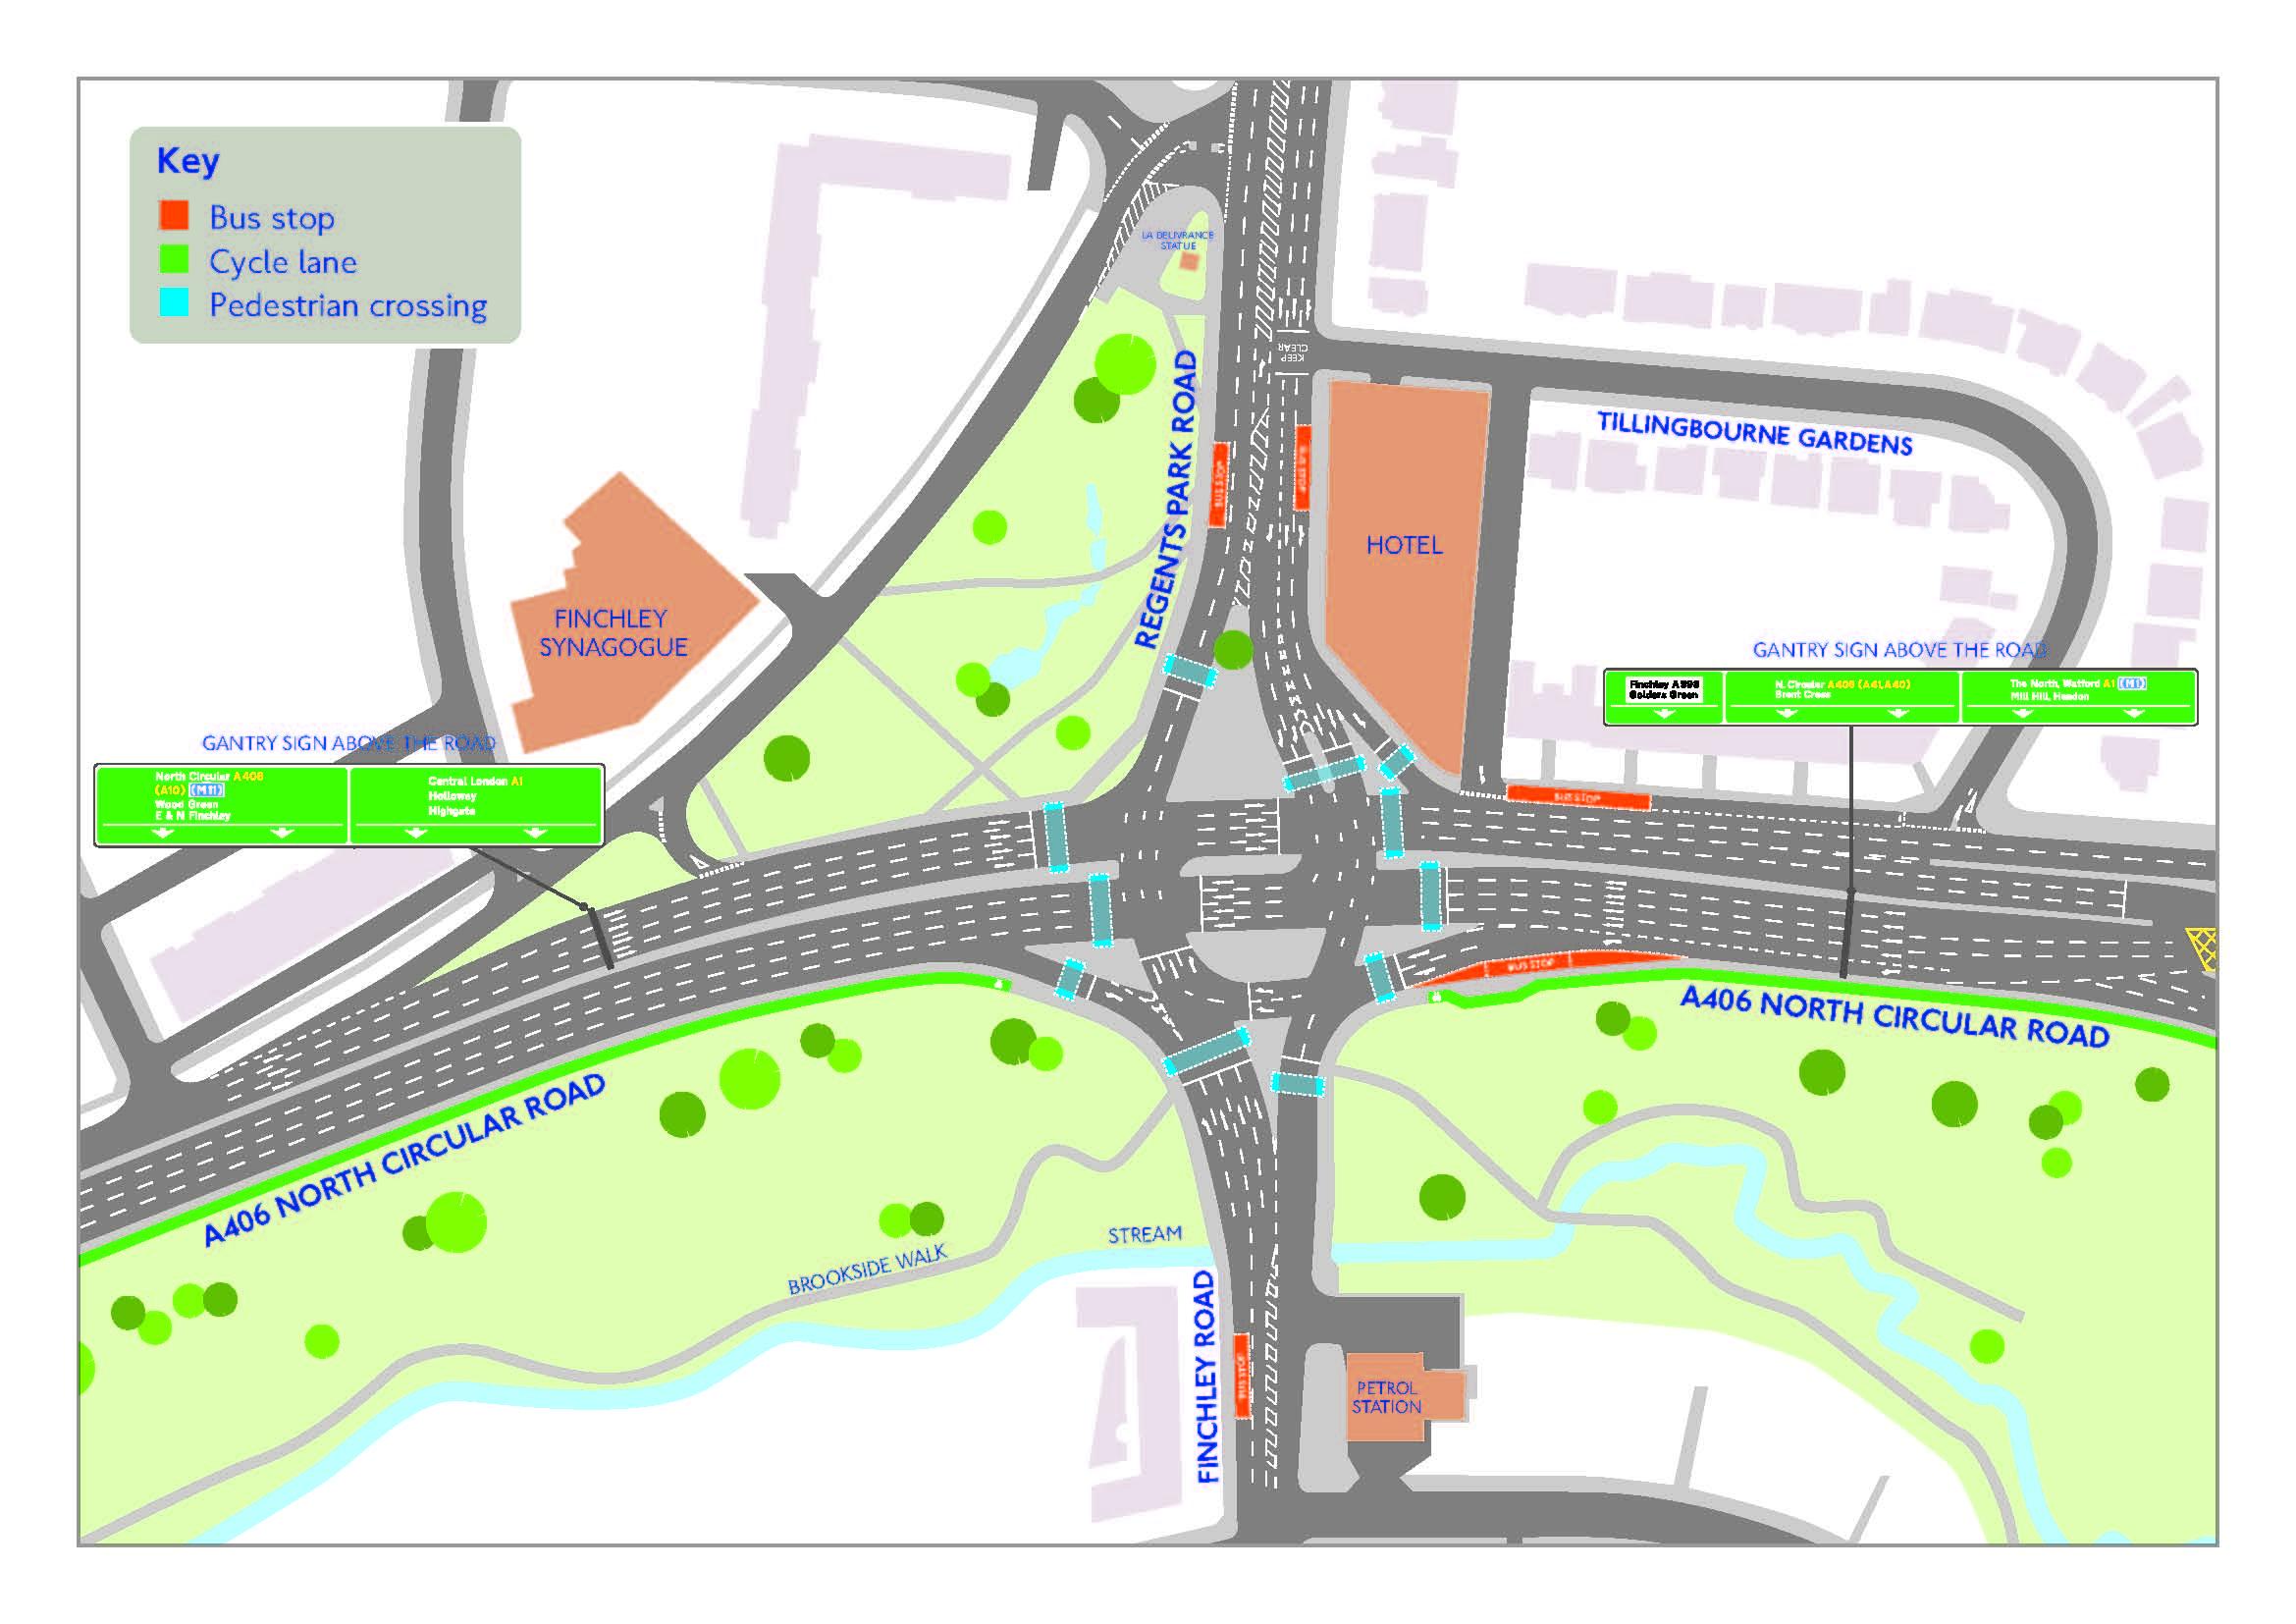 map-scheme-overview1 | Construction Enquirer on